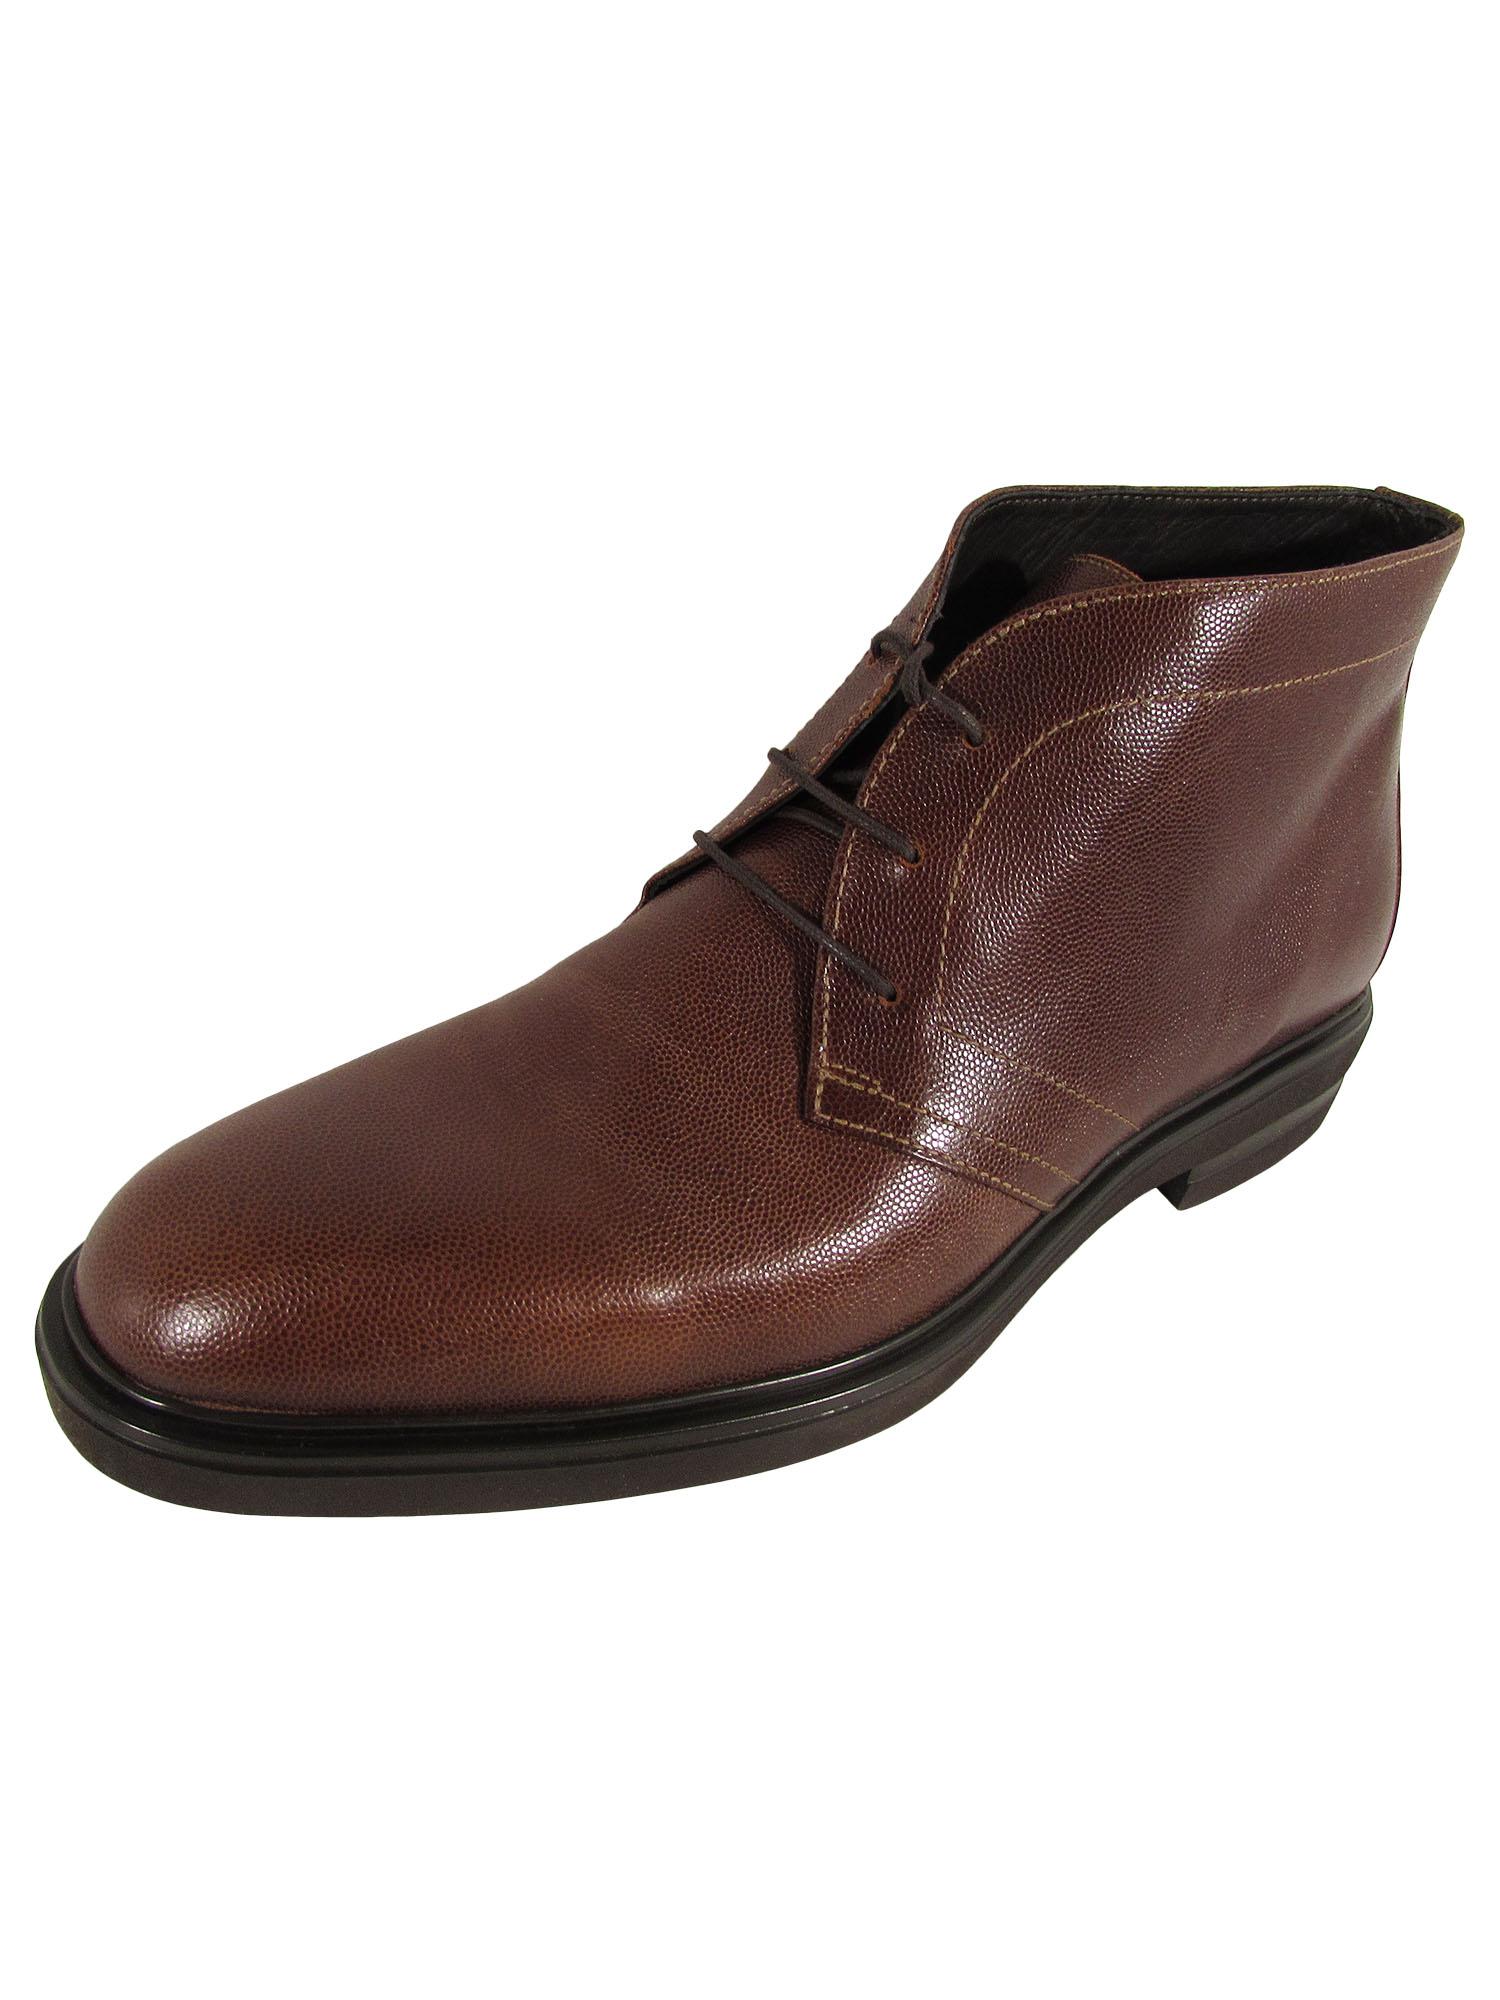 Donald J Pliner Uomo Ericio-ZG Ericio-ZG Uomo Pelle Chukka Boot Shoes ed7f5e